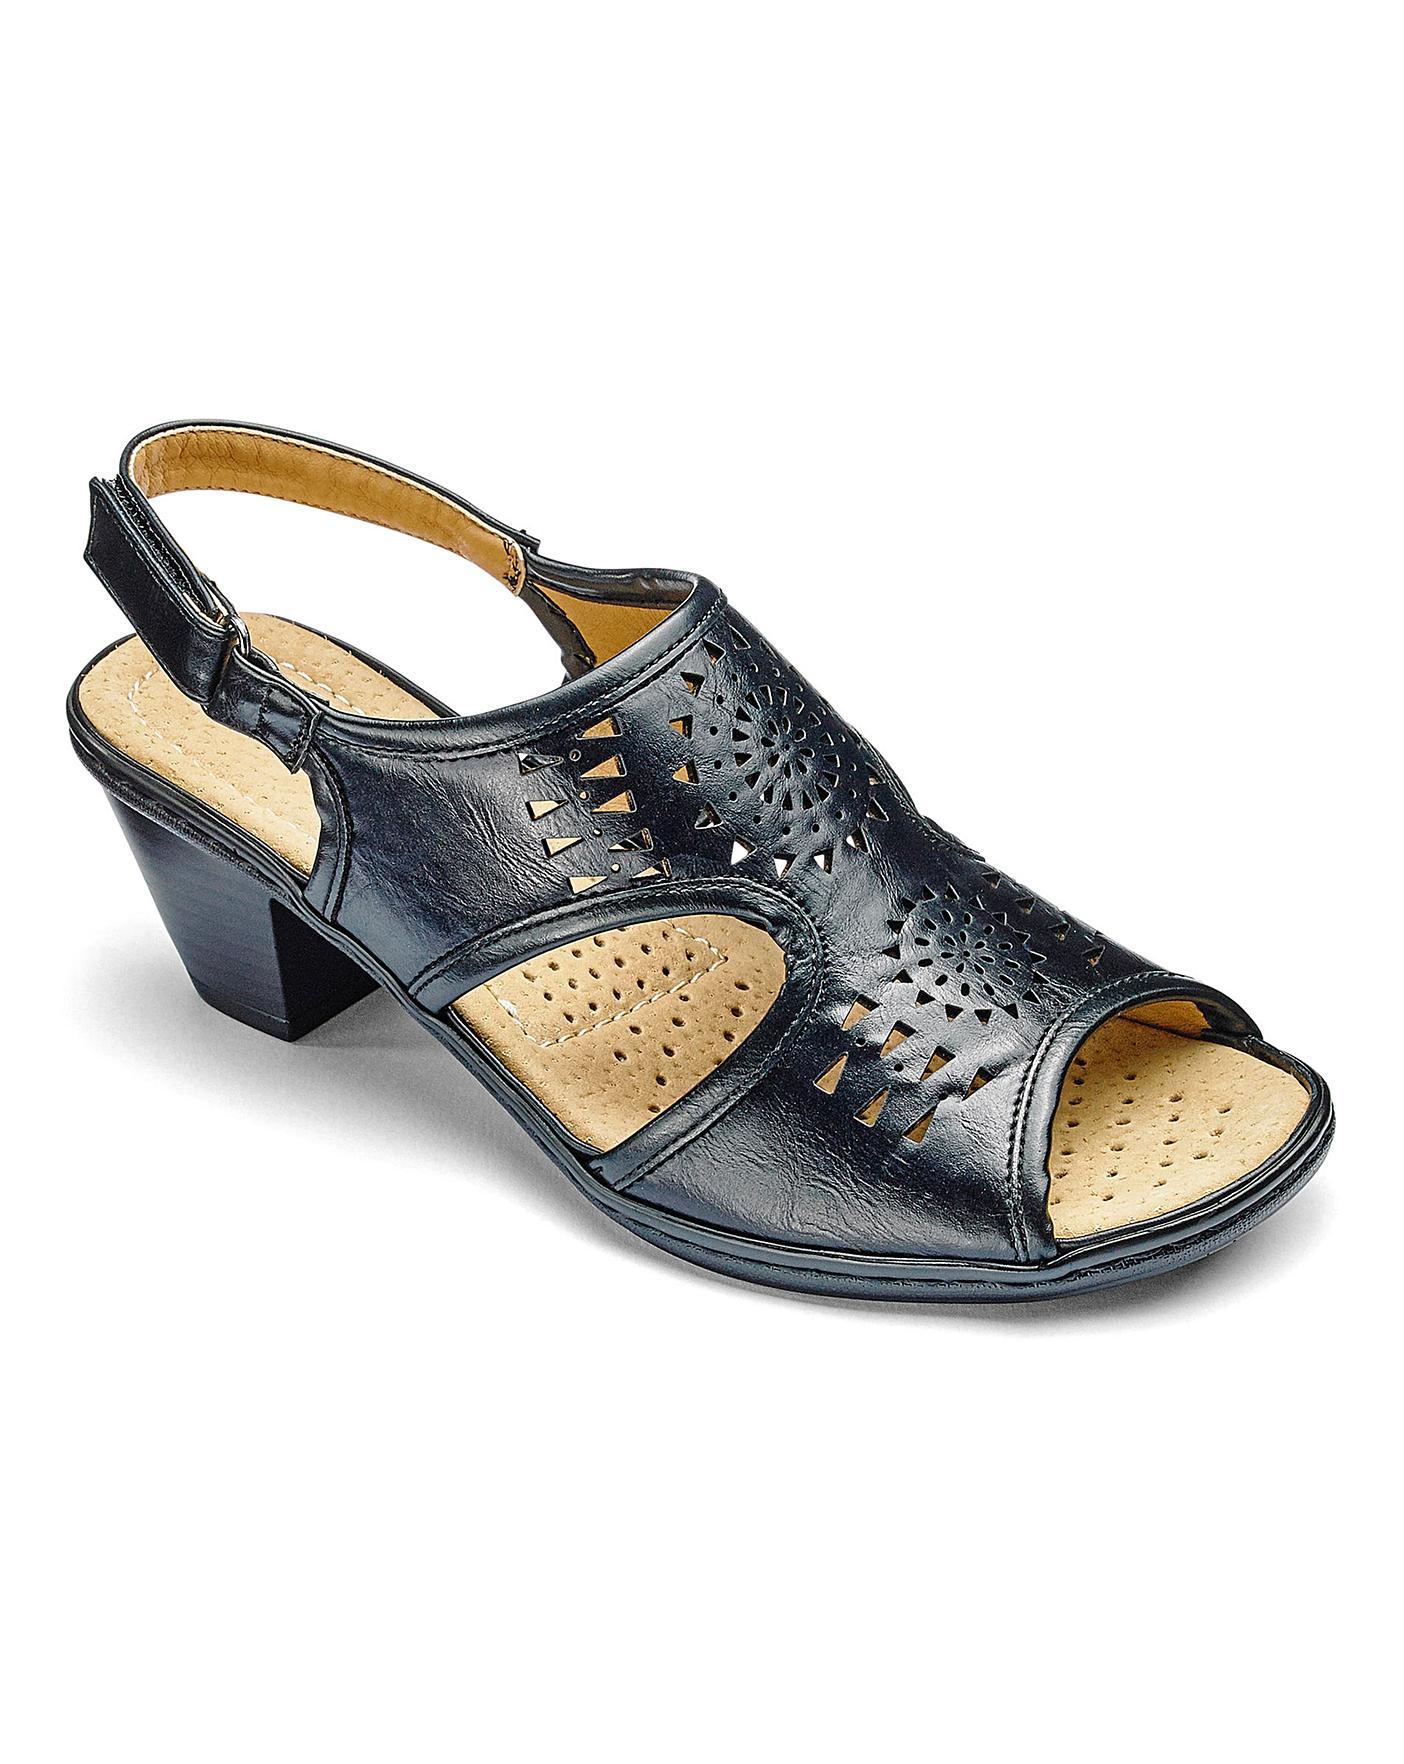 Cushion Walk Sandals EEE Fit   Ambrose